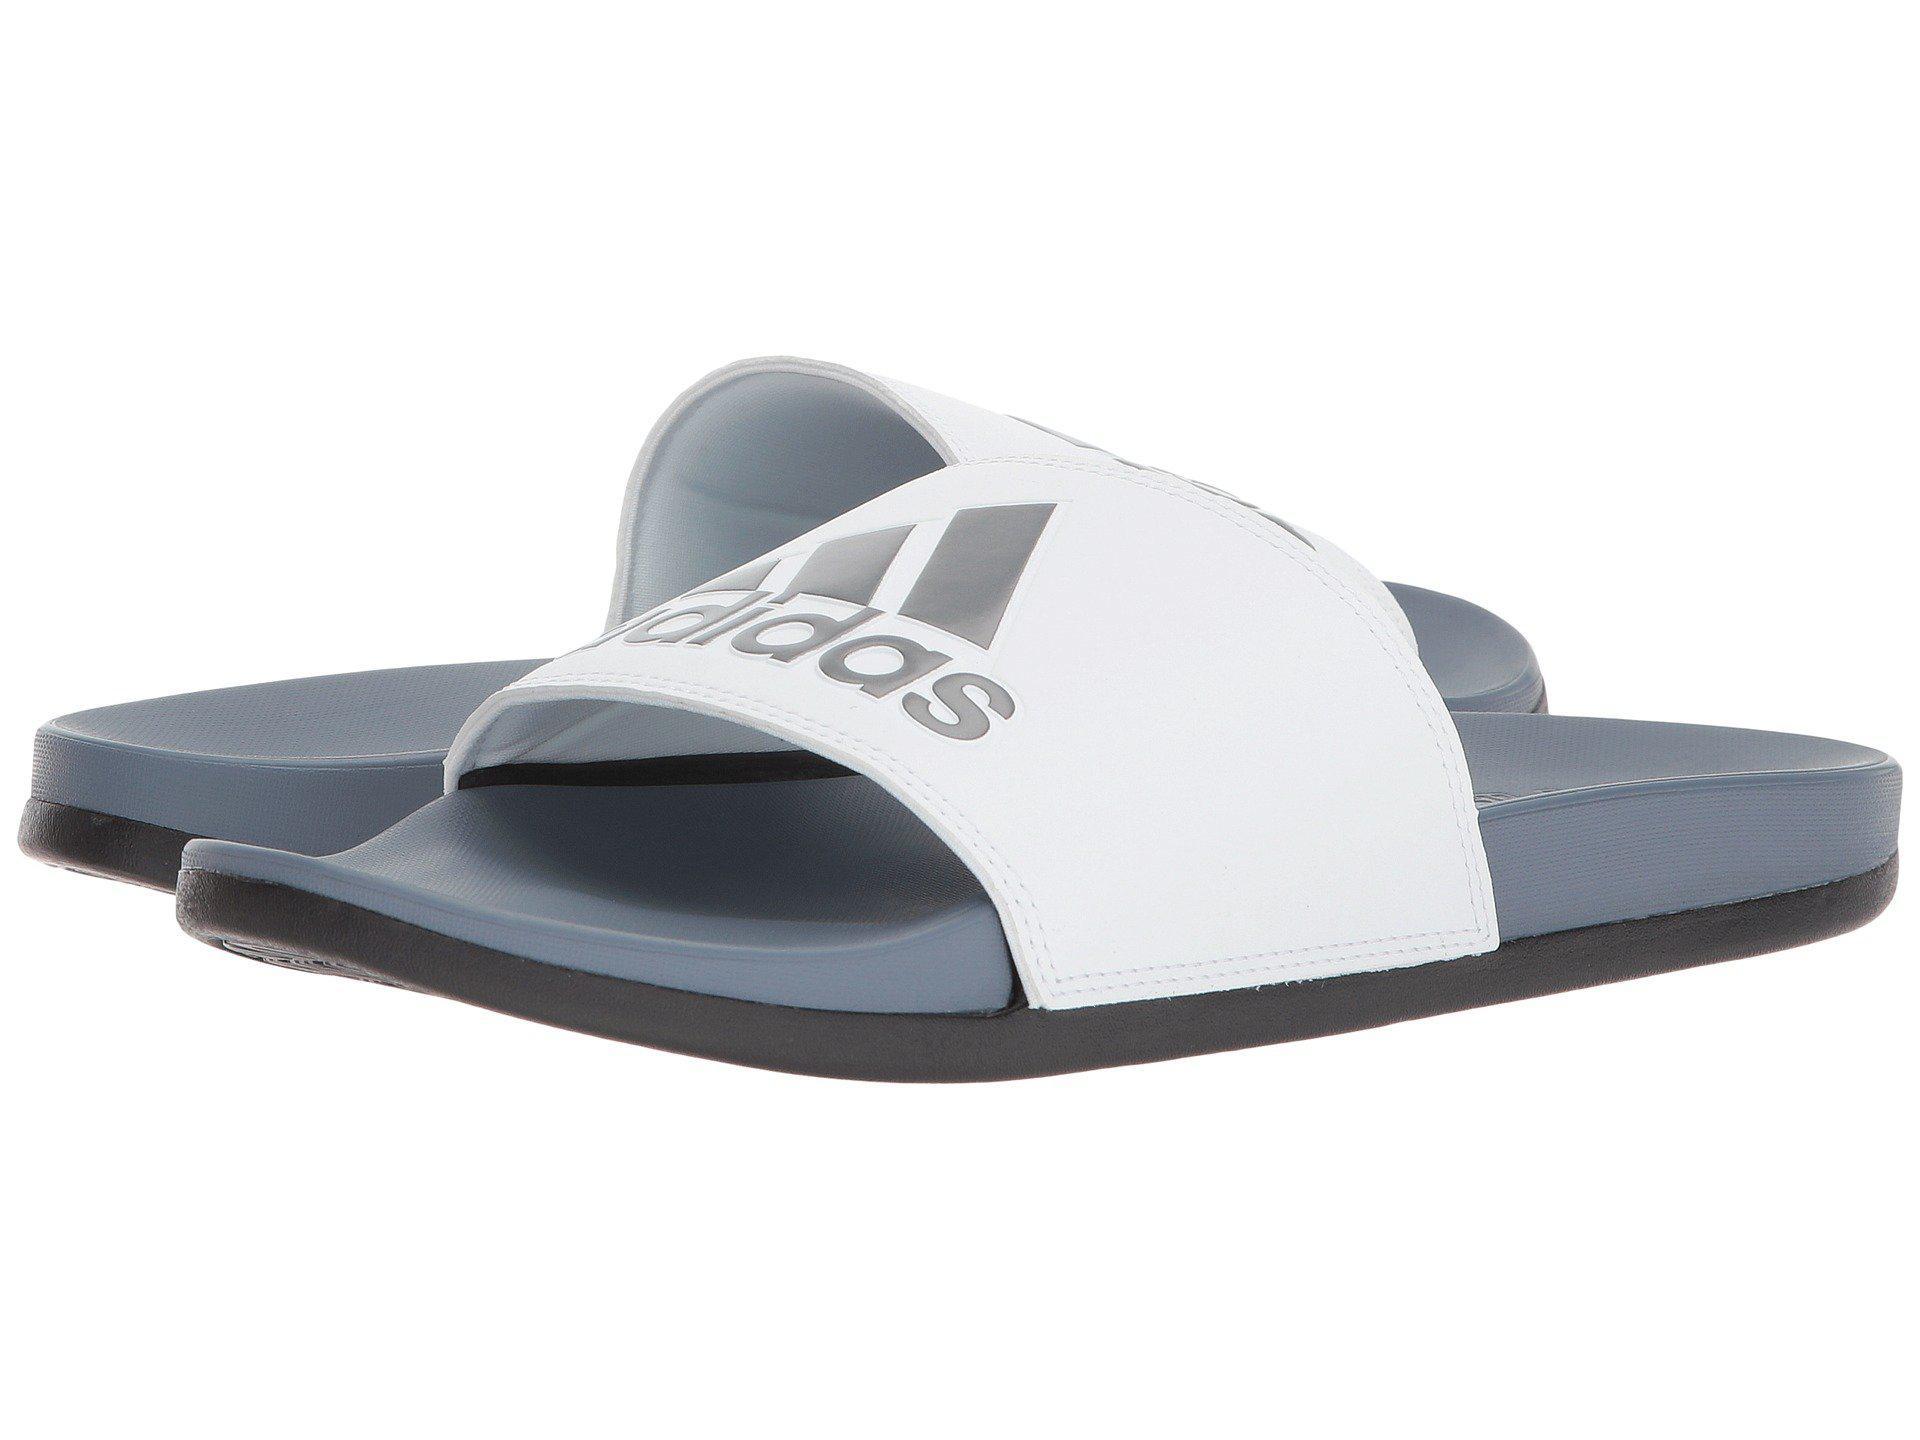 e023f7e2648e09 Lyst - adidas Adilette Cf+ Logo for Men - Save 35%